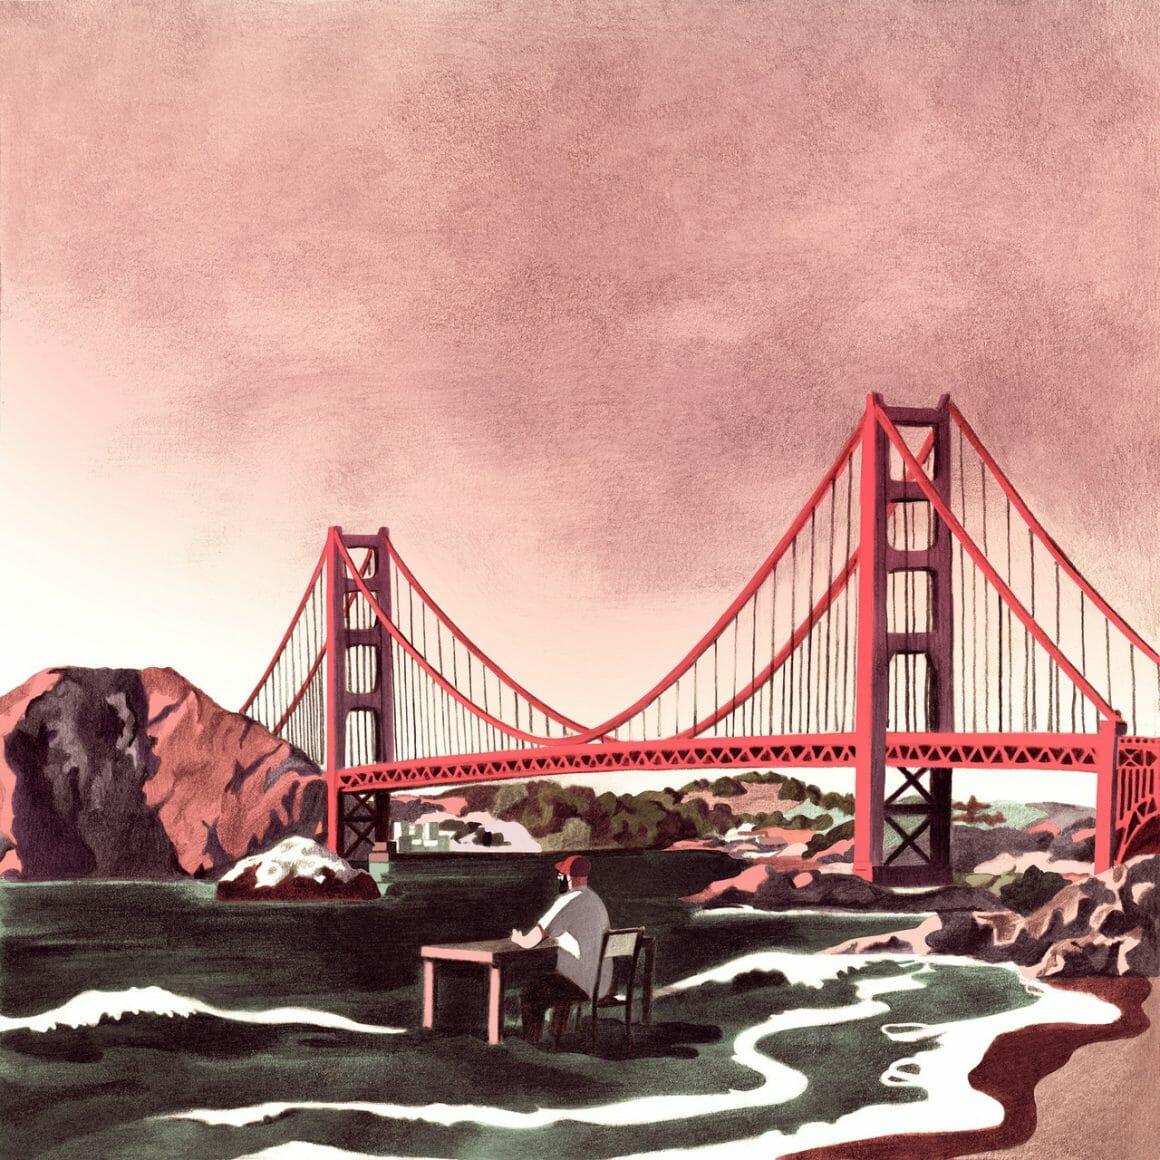 pont de Fan Francisco, golden gate dessin par Antoine Maillard